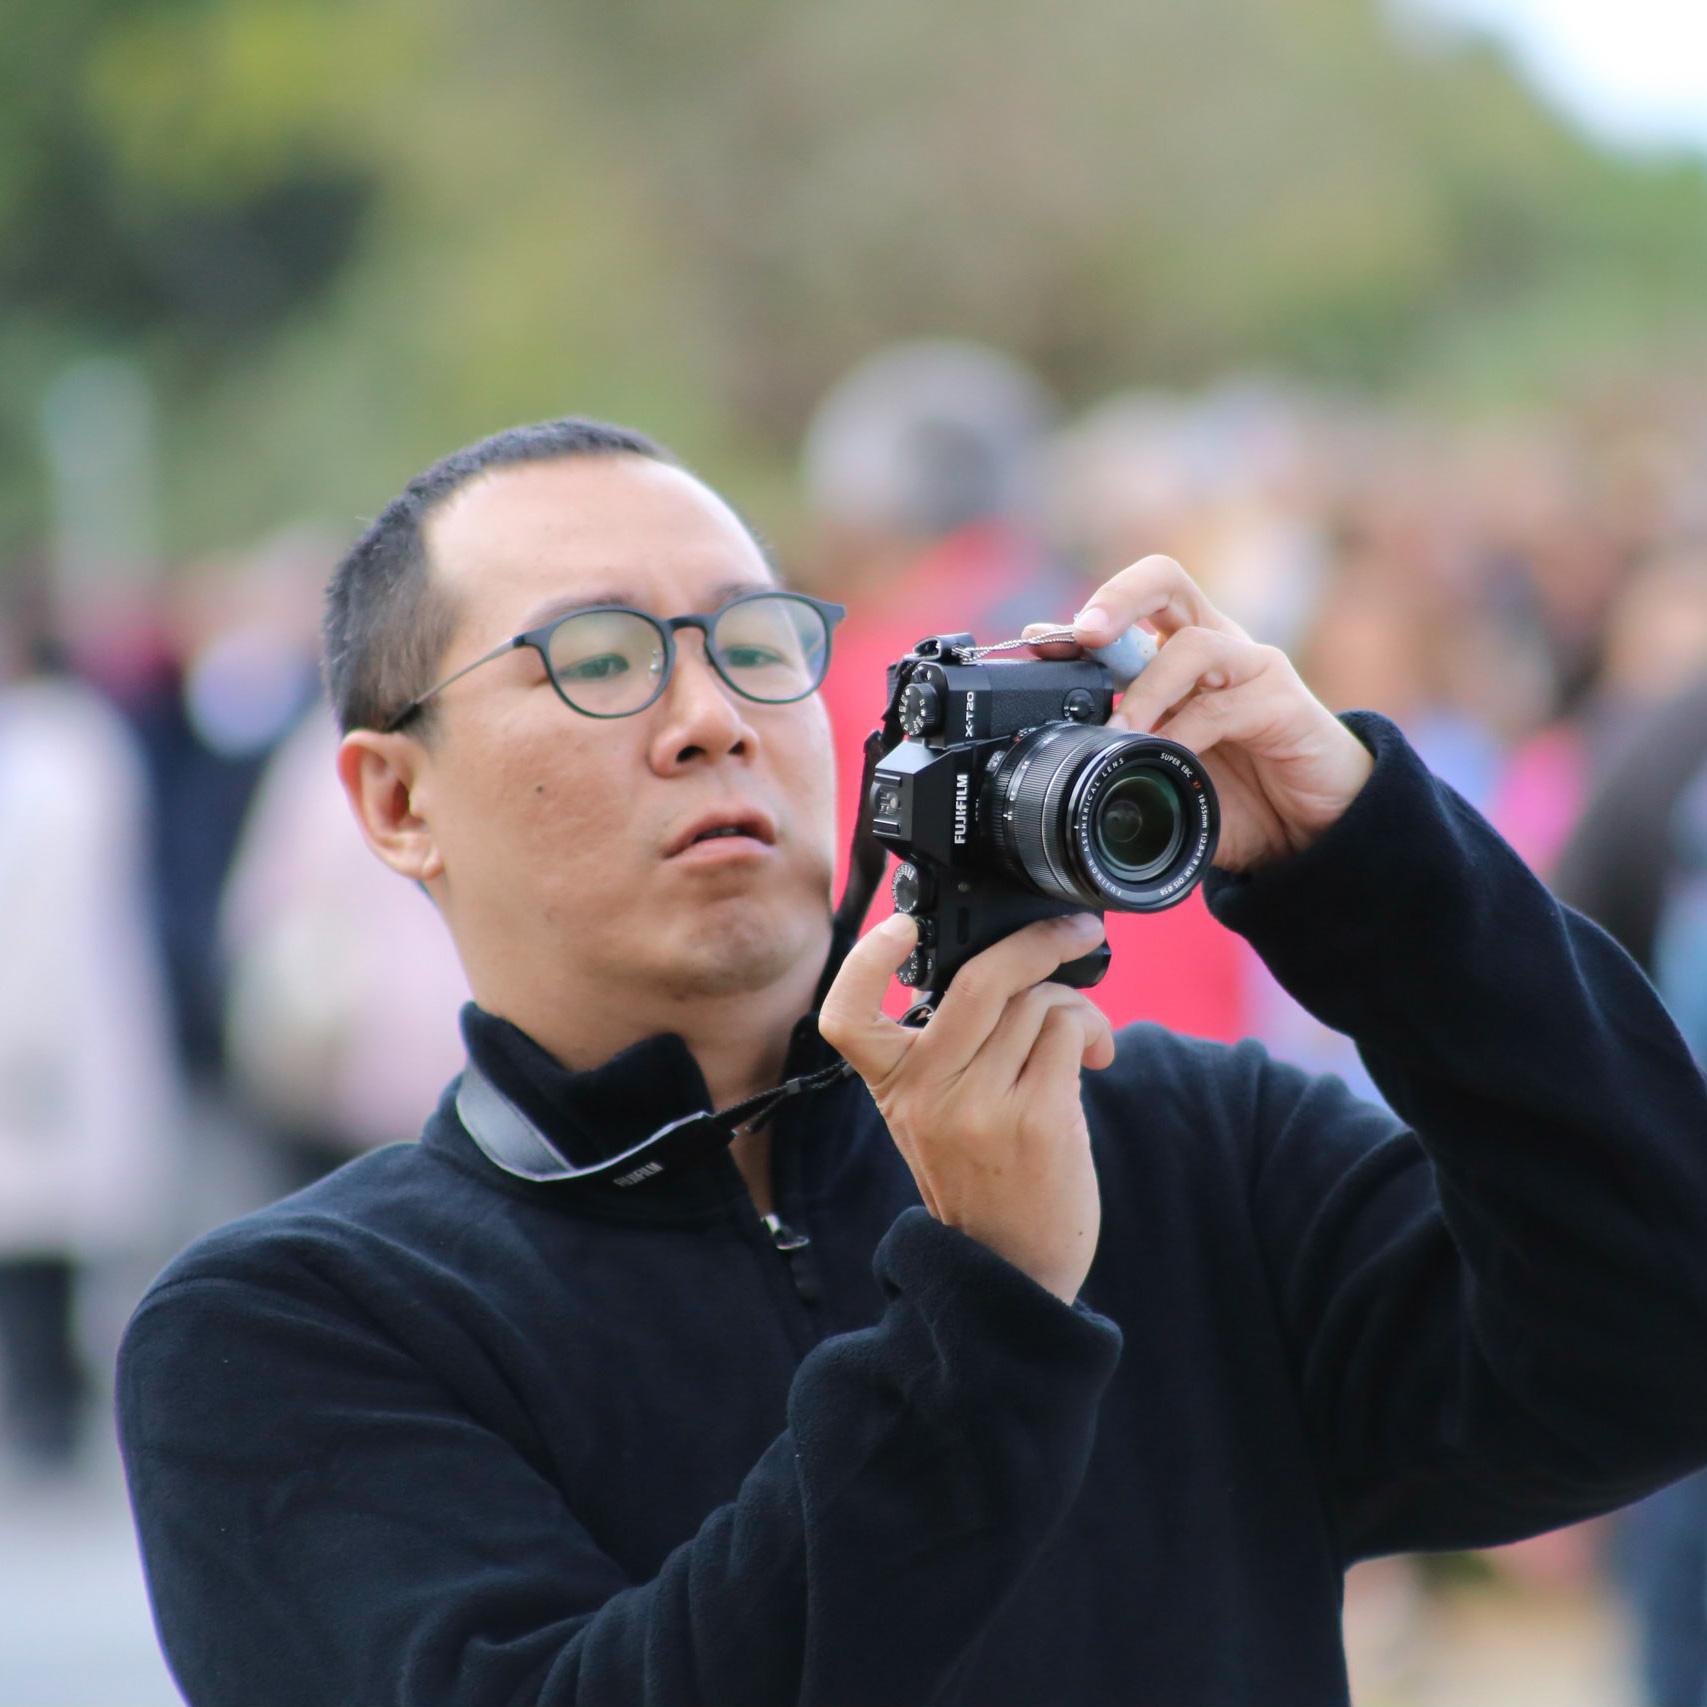 CameraLensPhoto.com: Black Friday - FUJIFILM X-T20 Mirrorless Digital Camera with 18-55mm